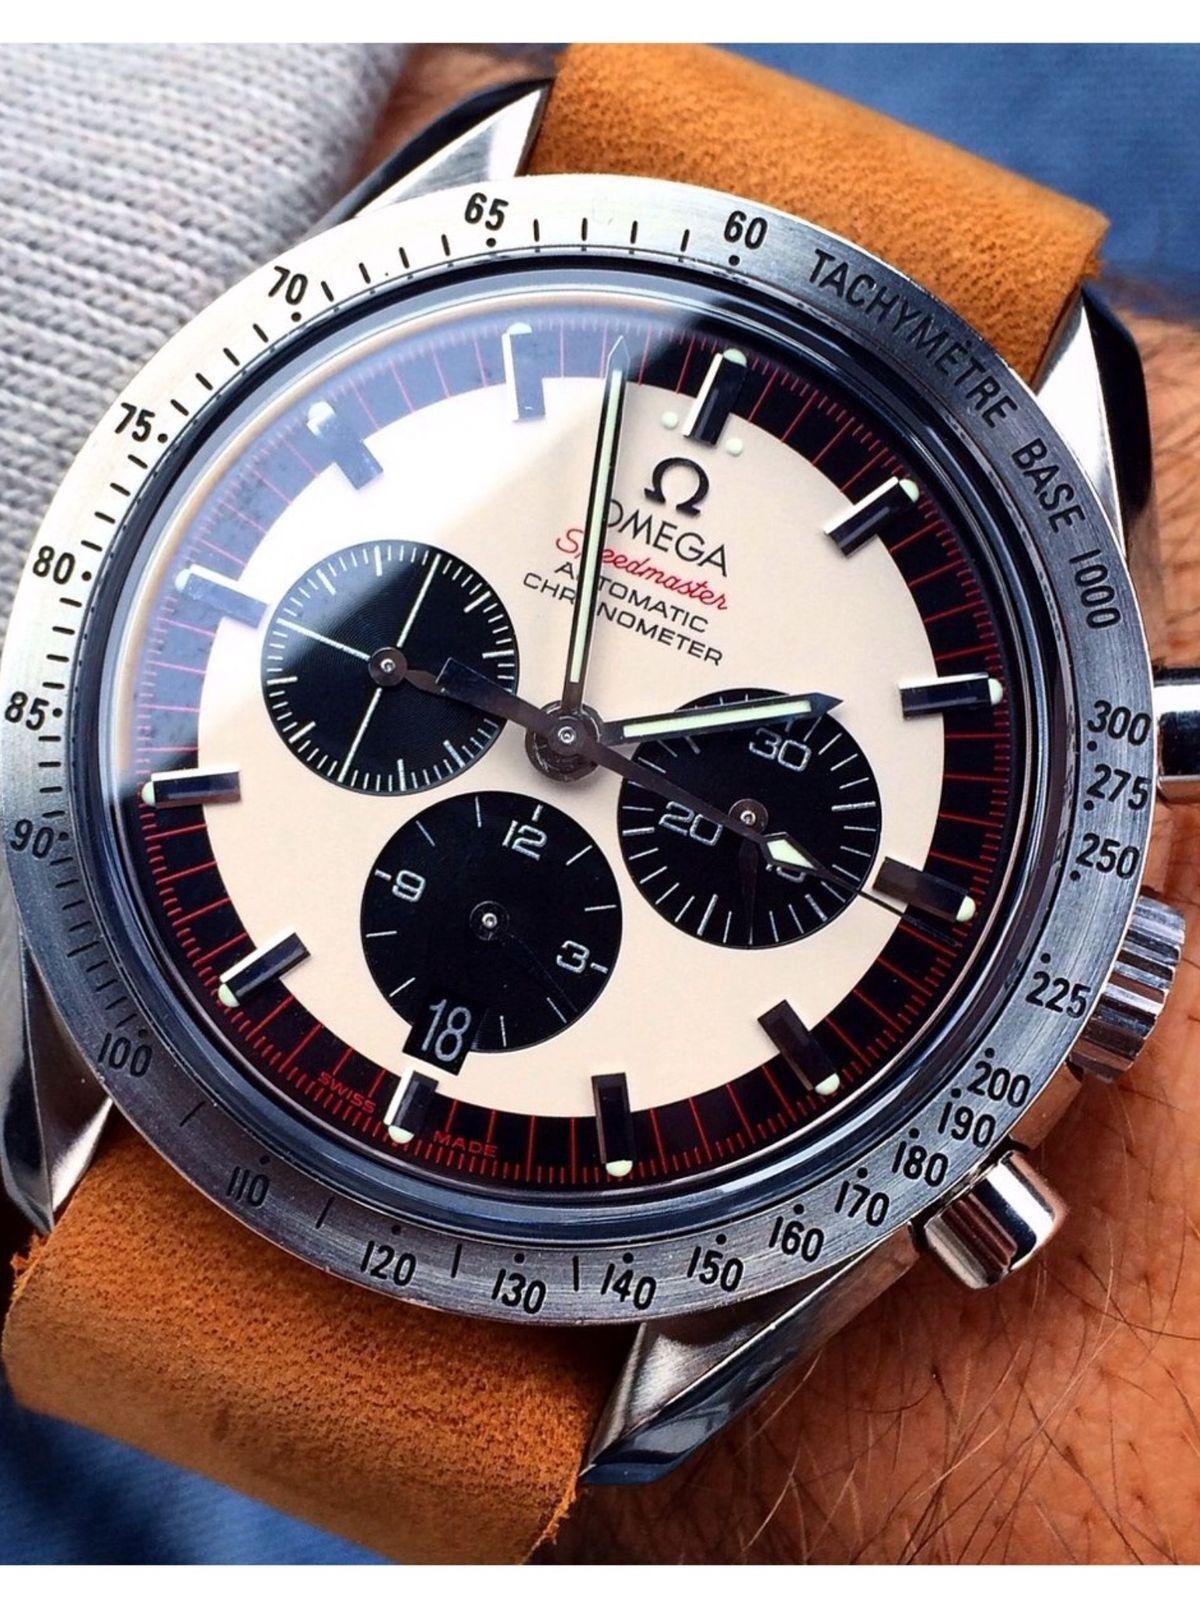 3ce8323a3b8 Omega Speedmaster